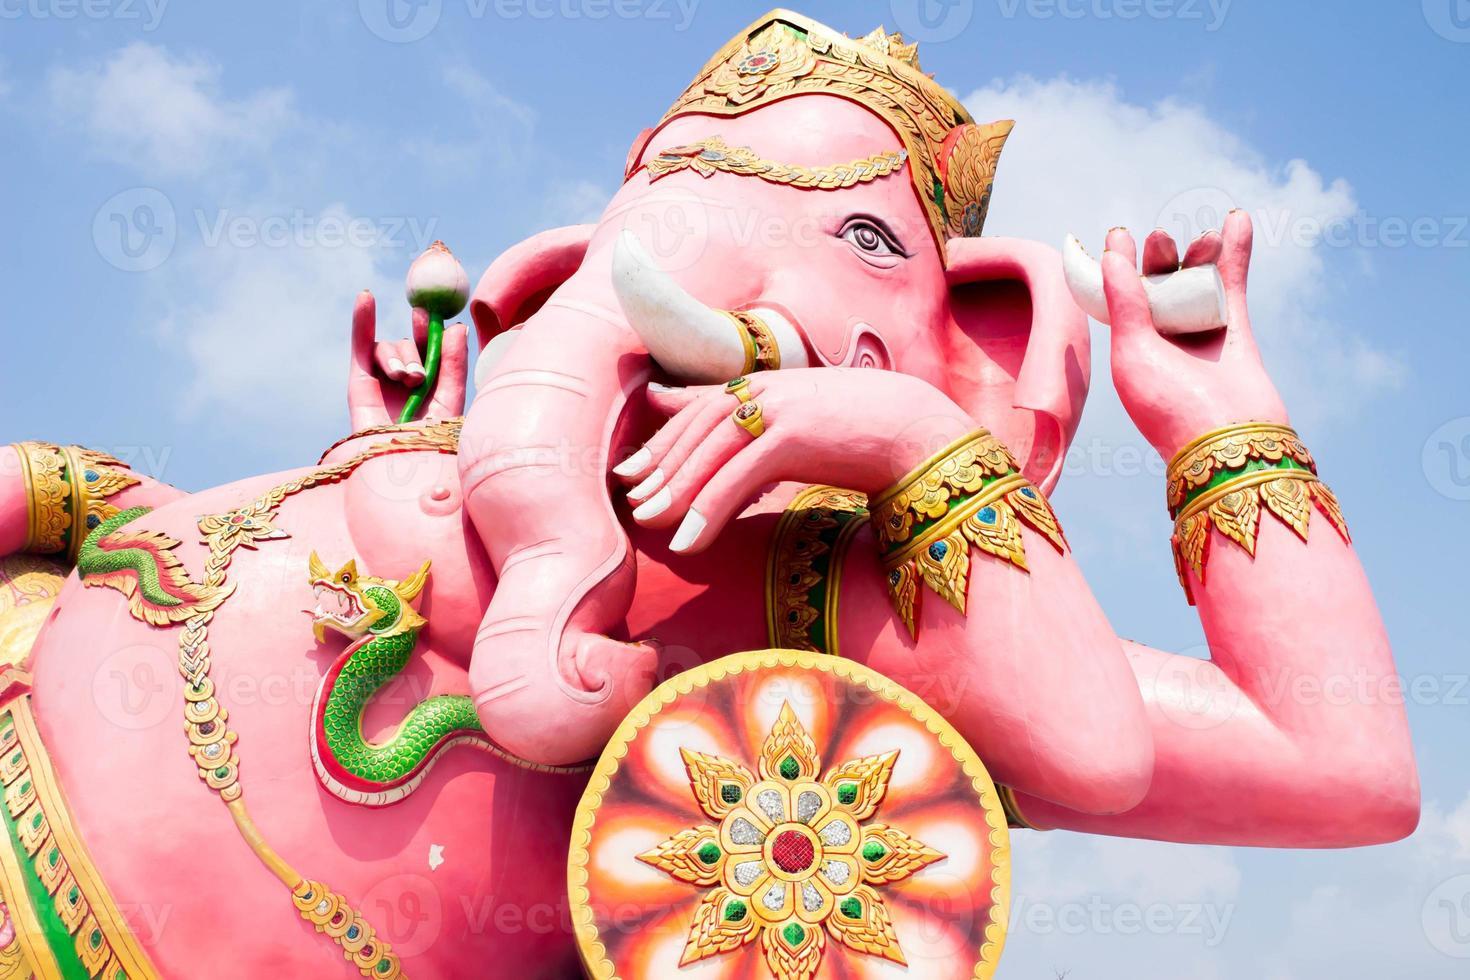 Statua di Ganesh nella provincia di Prachinburi in Thailandia foto